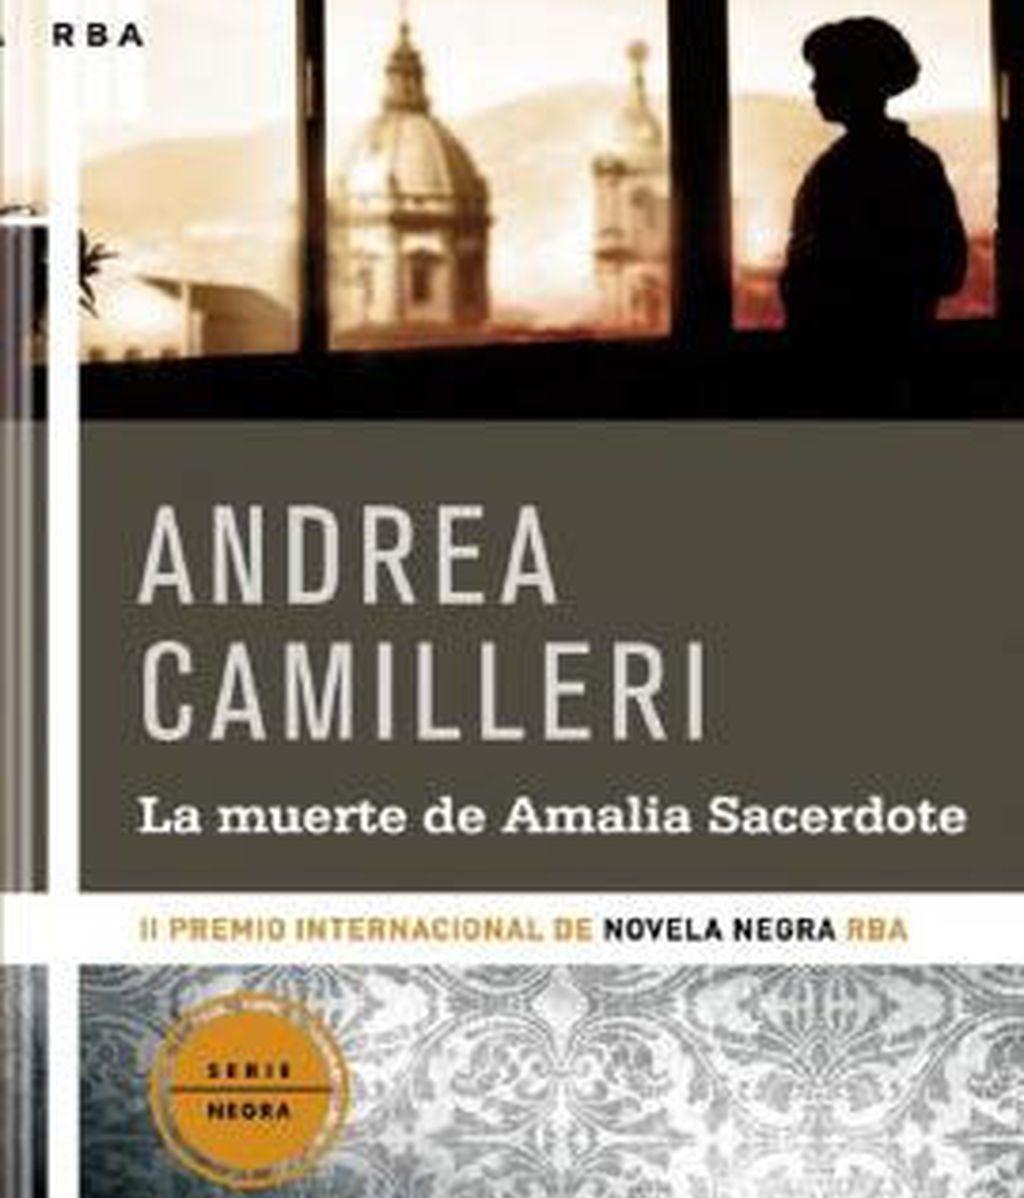 LA MUERTE DE AMALIA SACERDOTE (ANDREA CAMILLERI)